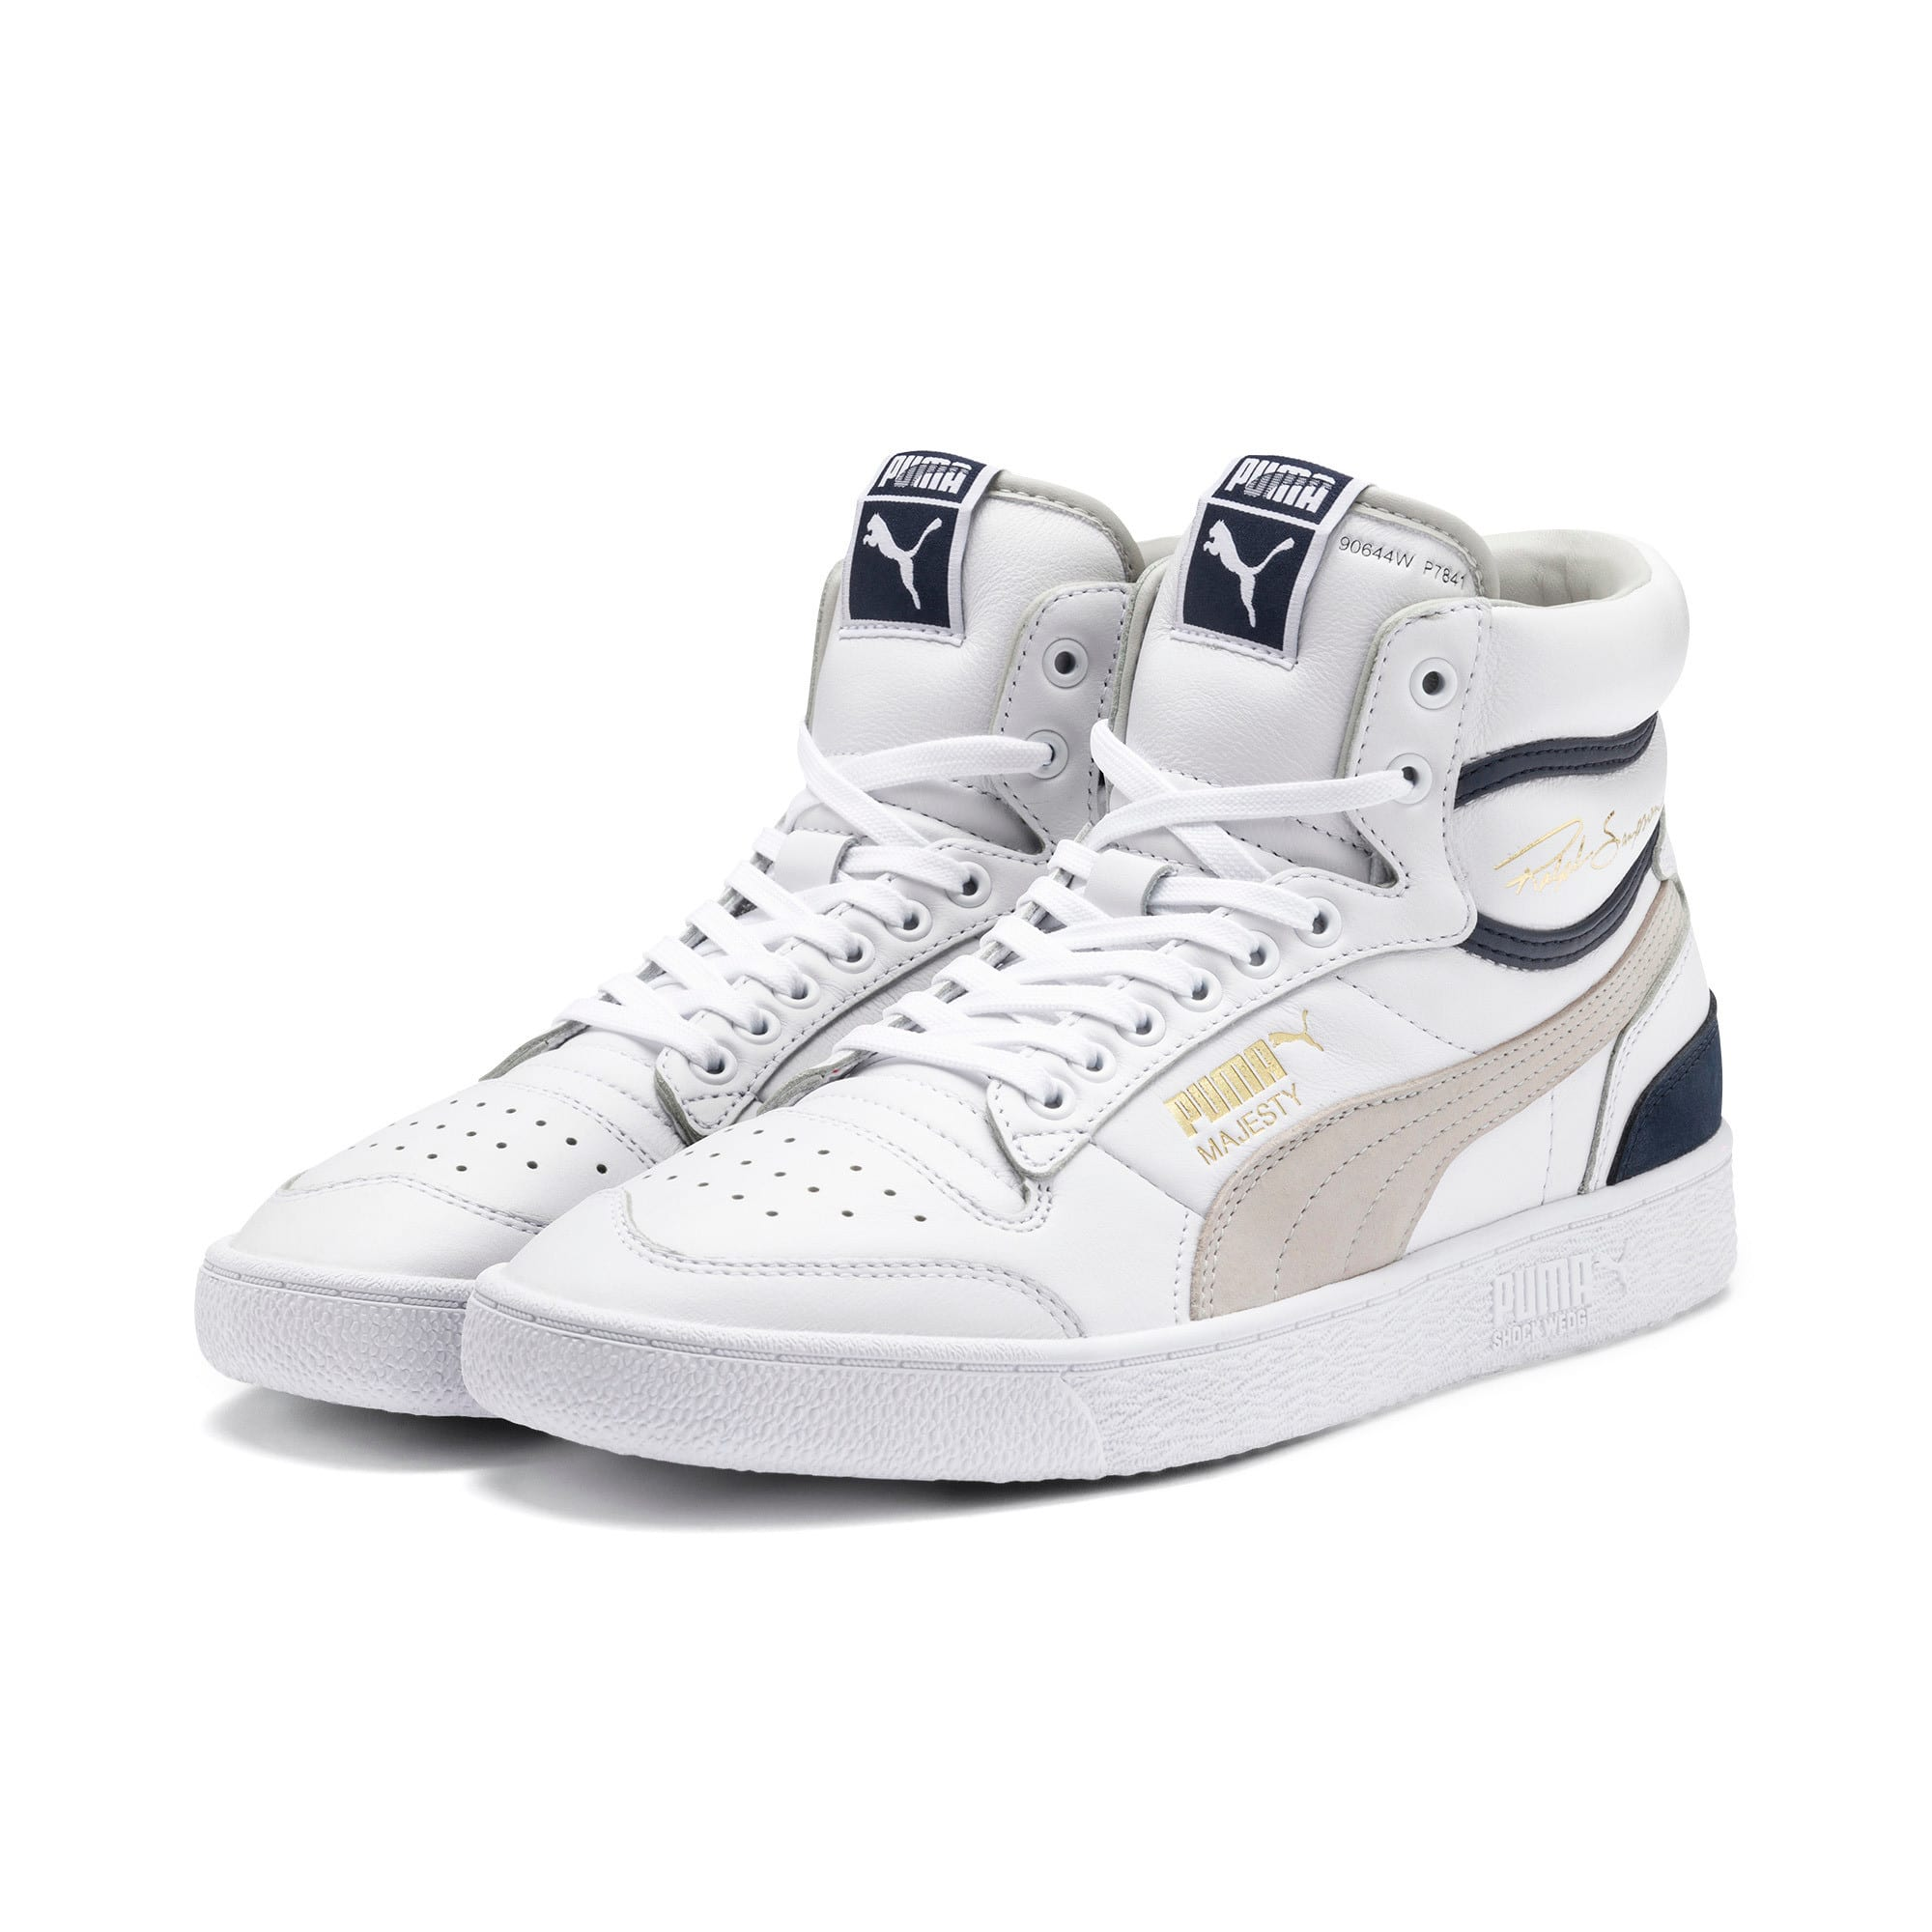 Miniatura 2 de Zapatos deportivos de caña media Ralph Sampson OG, Puma Wht-Gray Violet-Peacoat, mediano